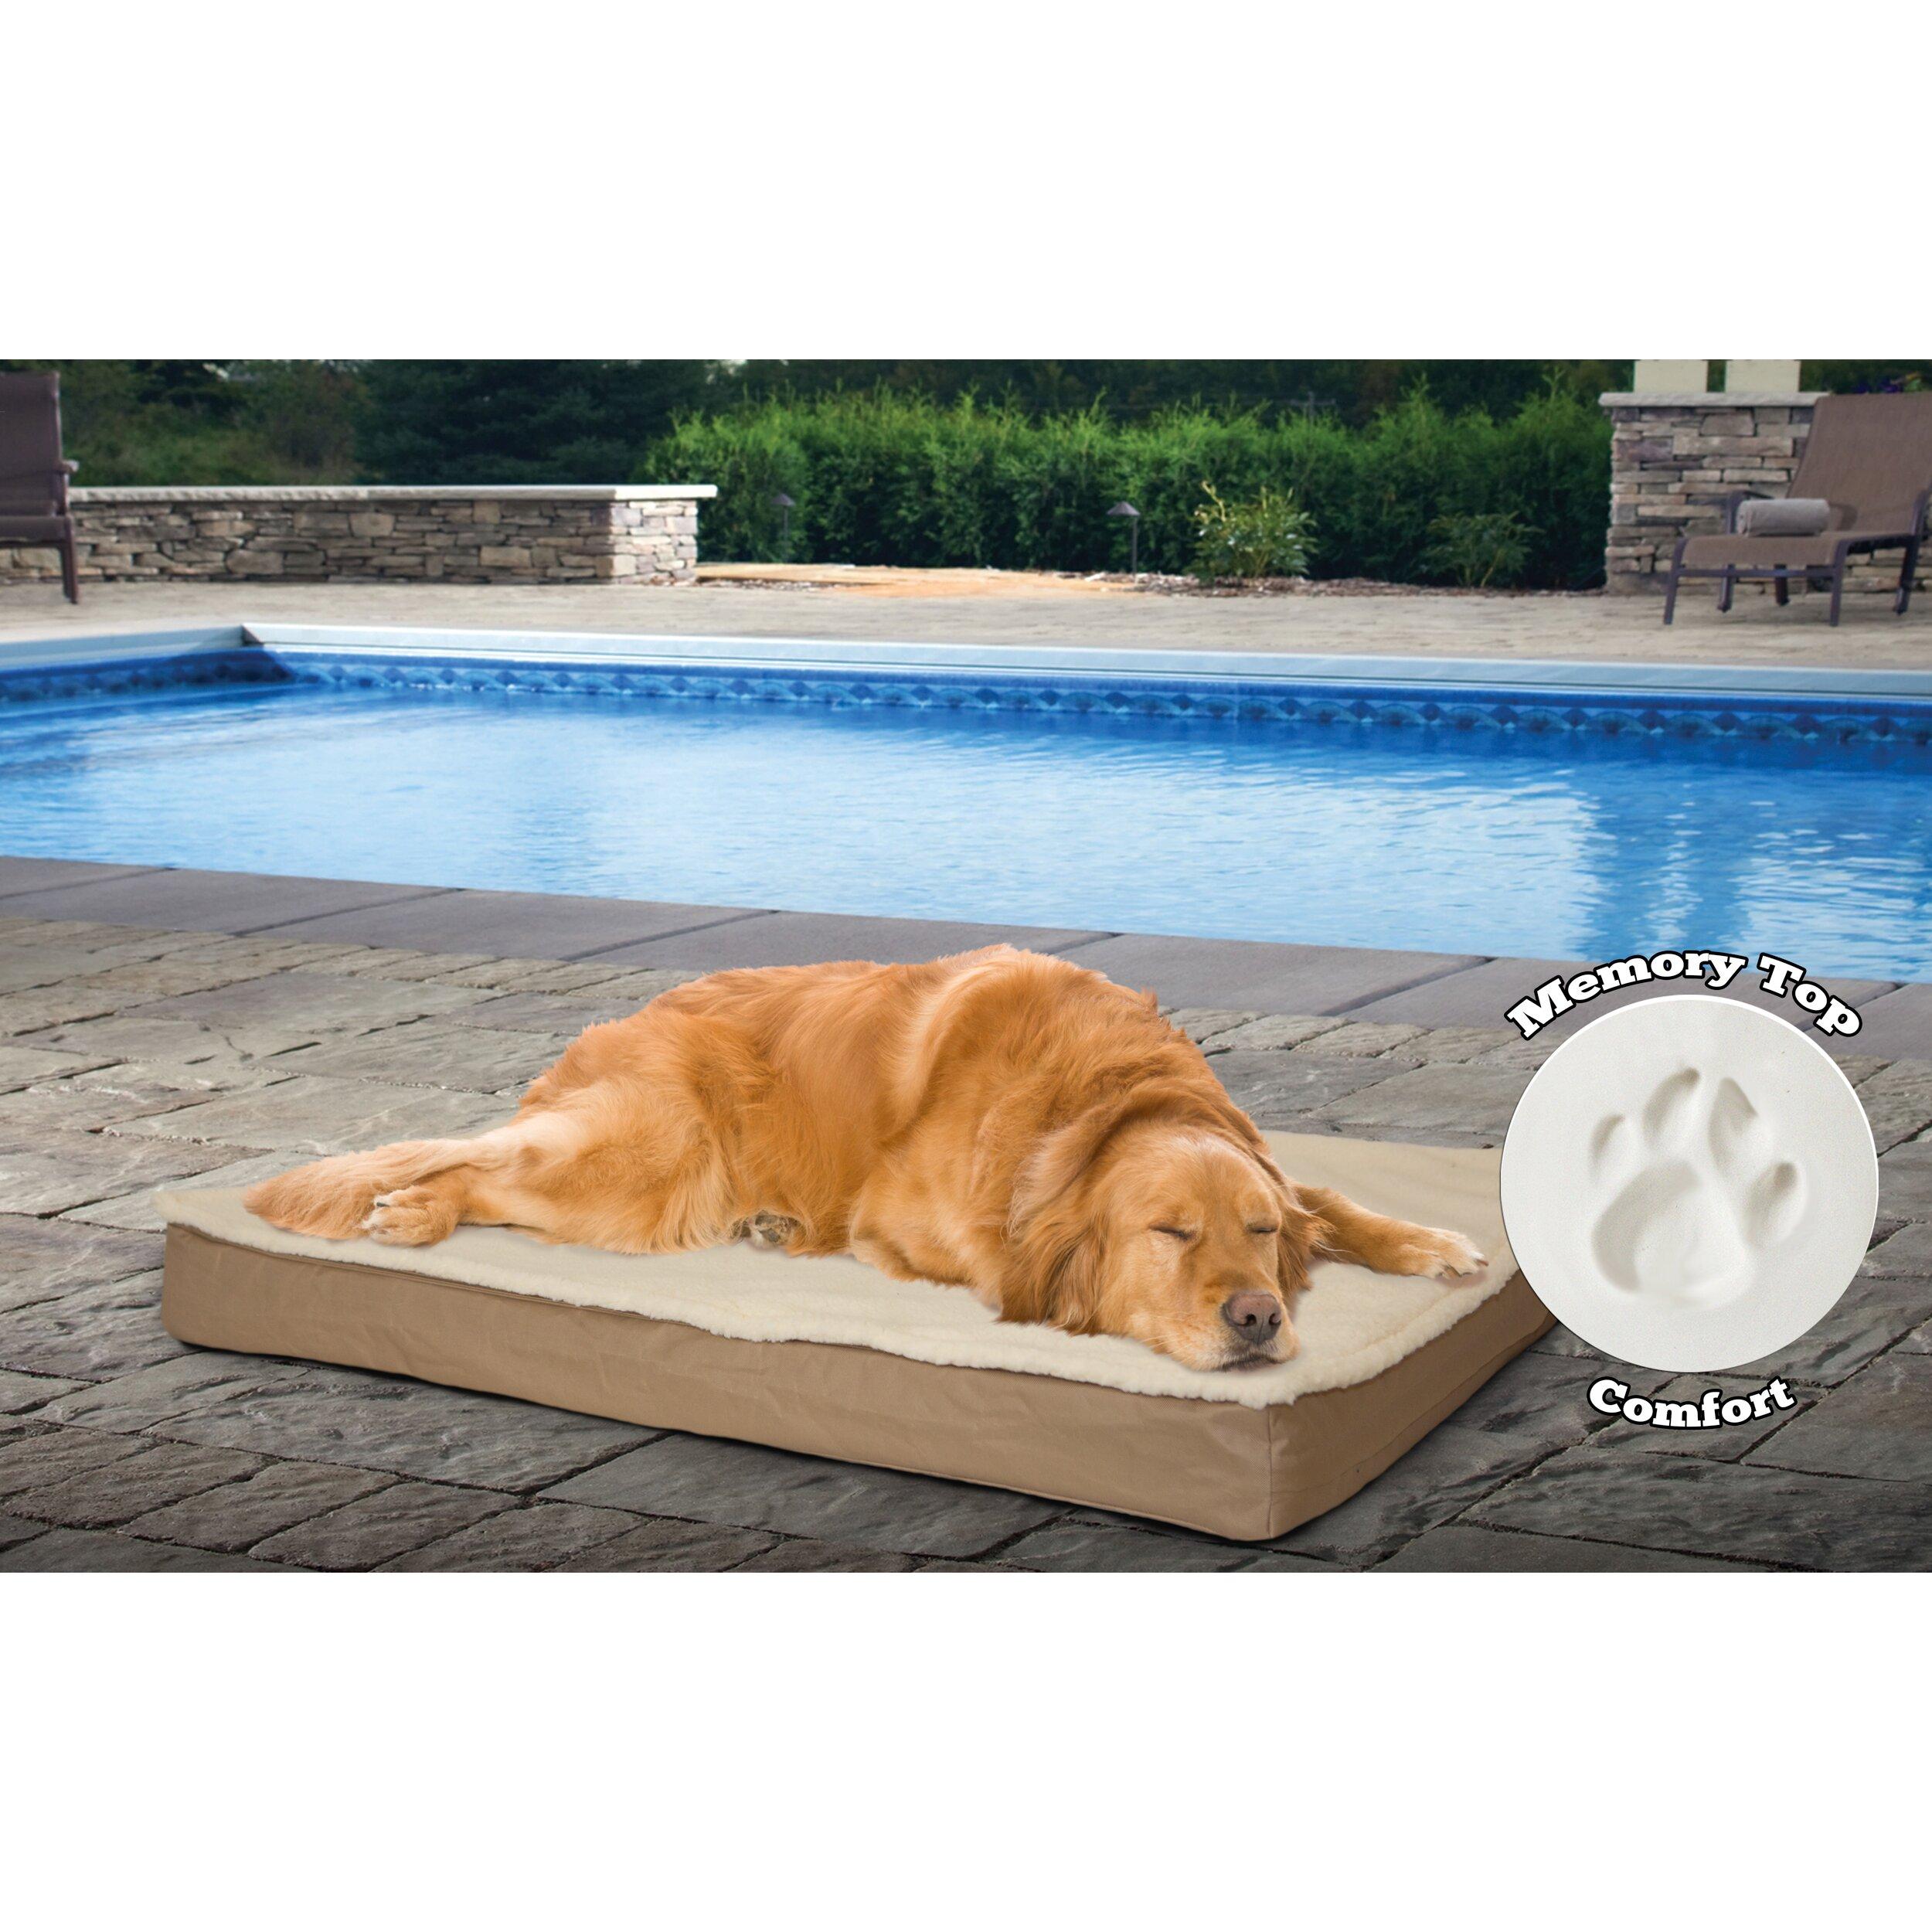 Furhaven Memory Foam Dog Bed Reviews